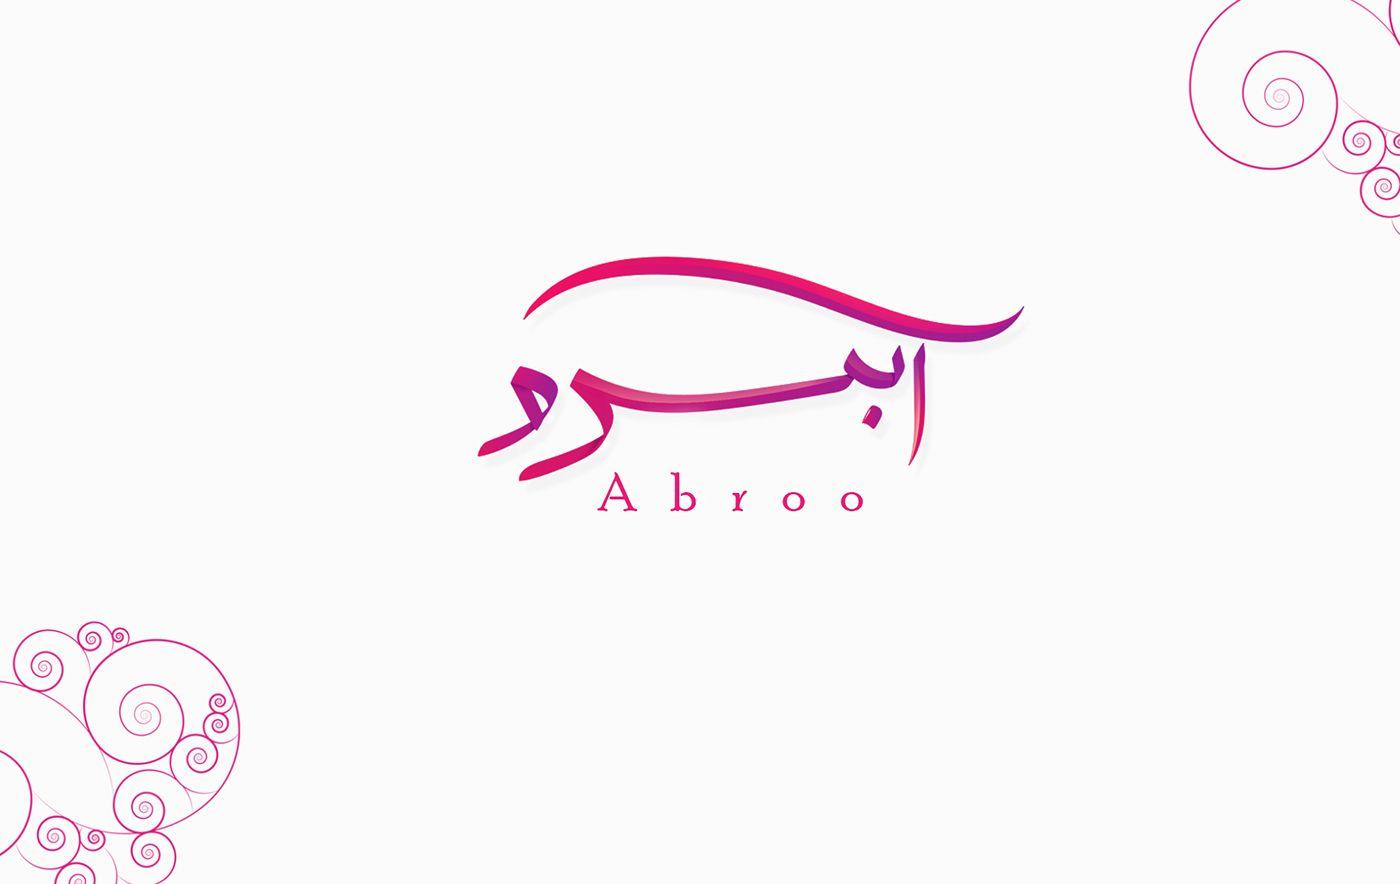 Arabic Name Logo Design Free Psd On Behance Logos Design